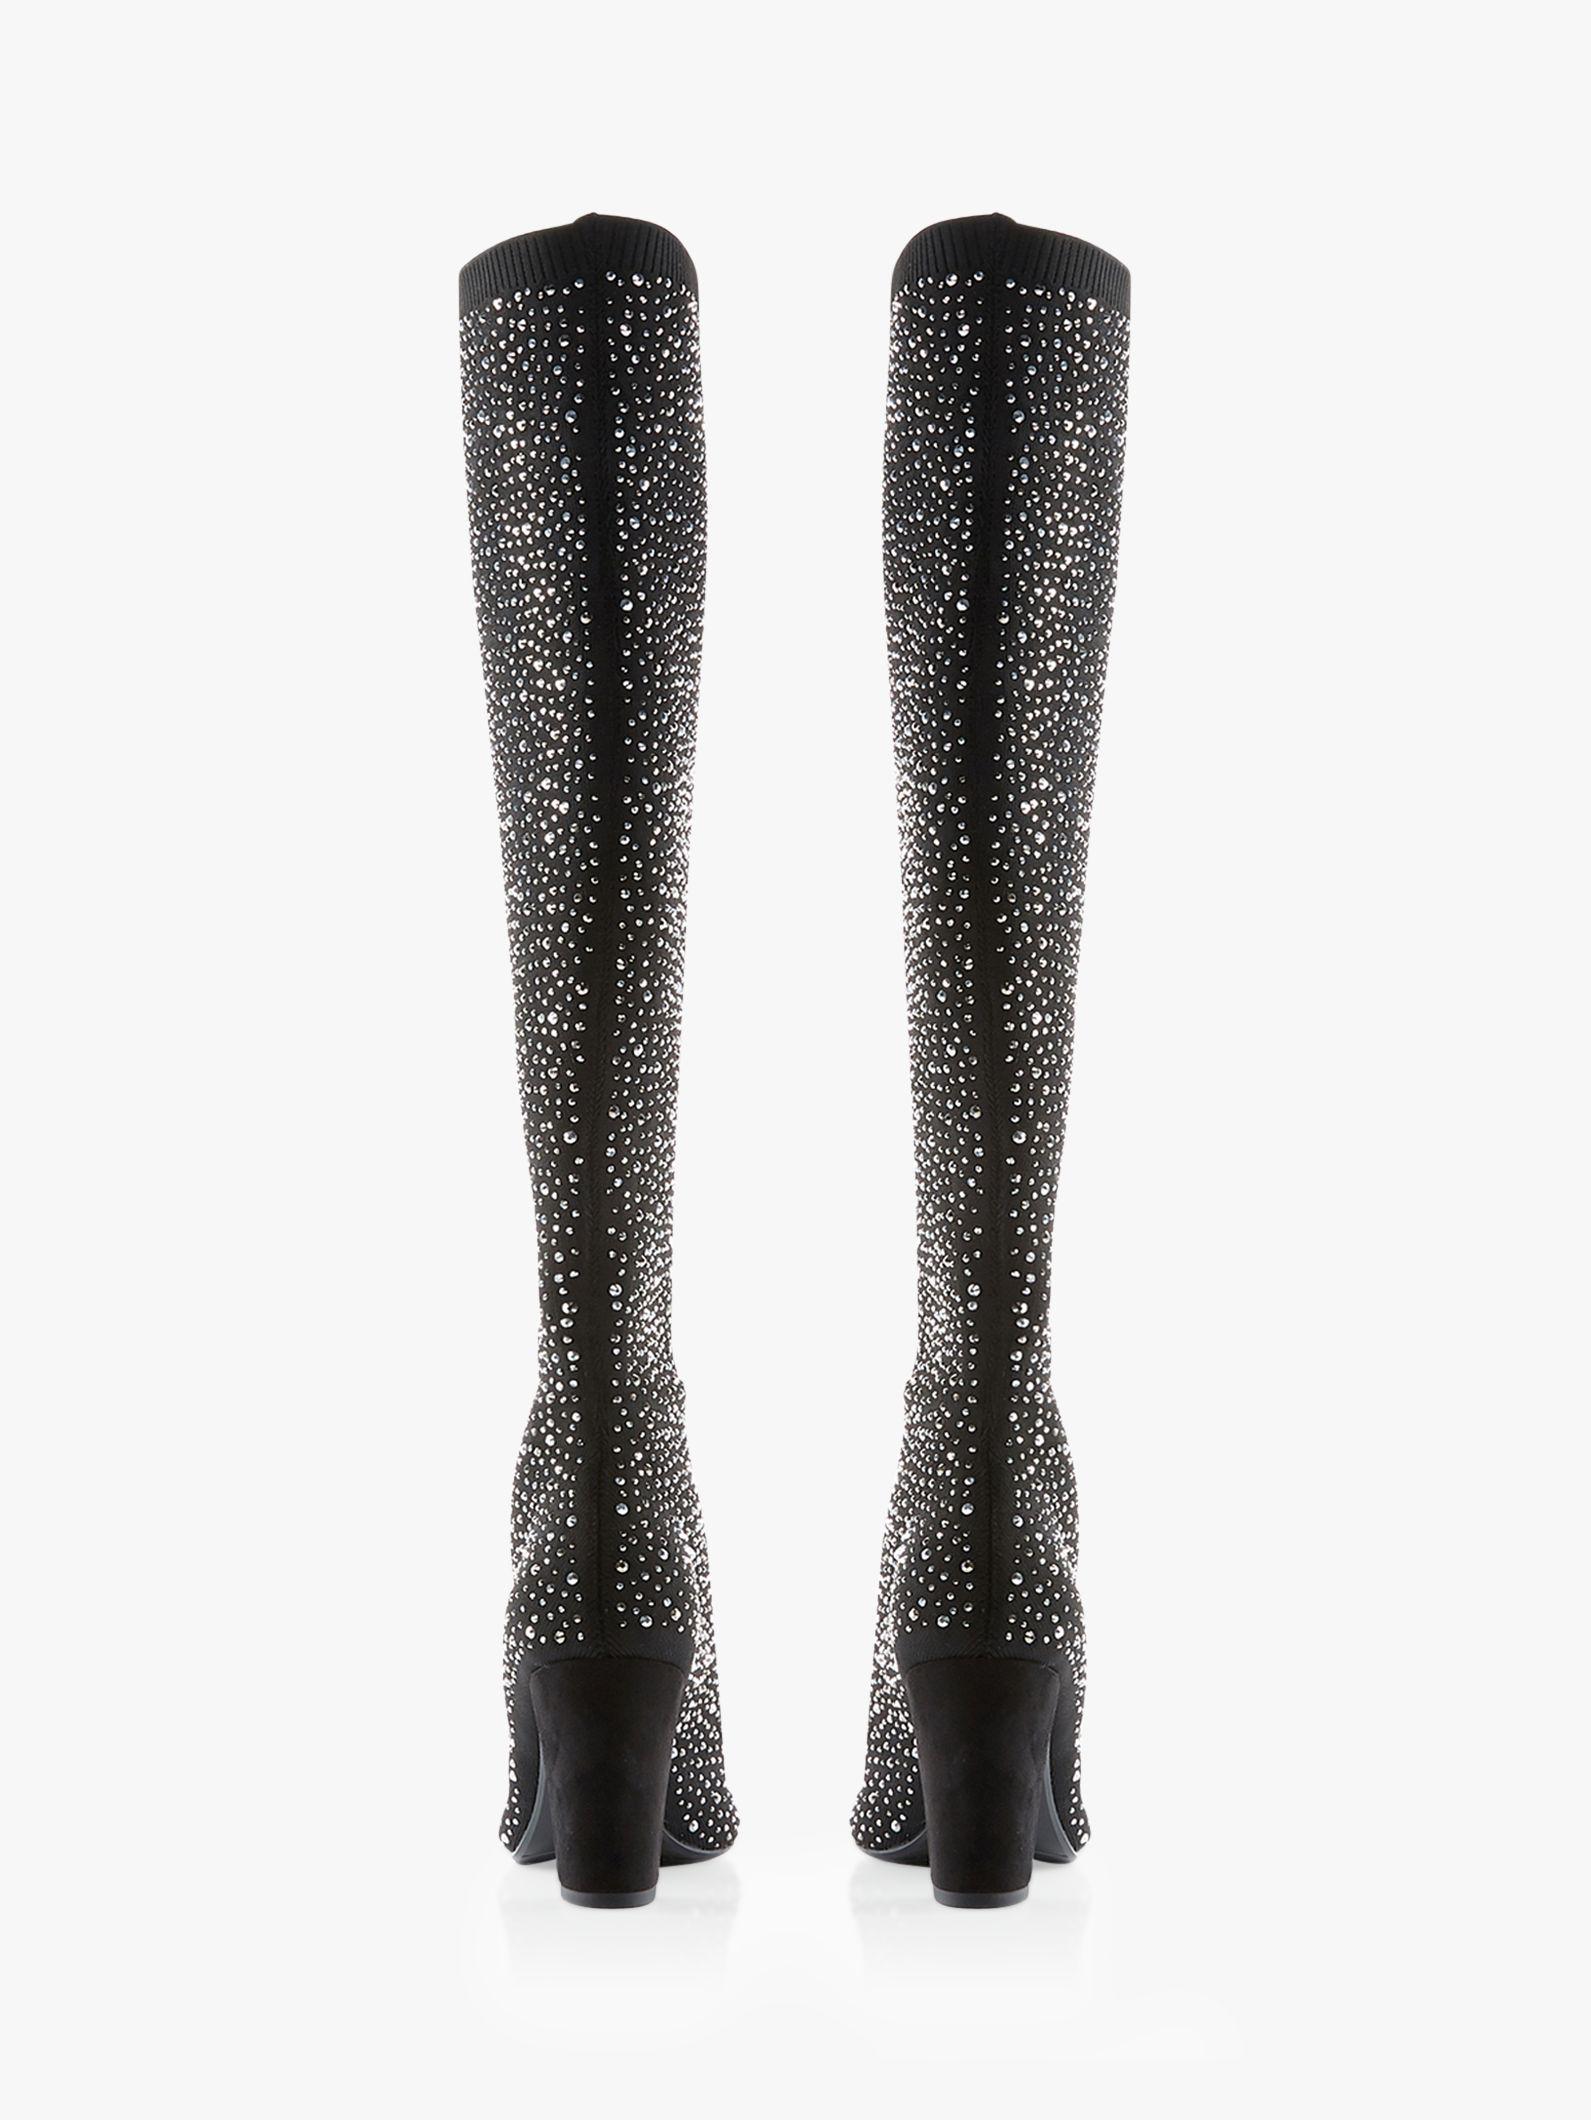 7f67d6e52e Dune Socialite Block Heel Embellished Over The Knee Boots in Black ...